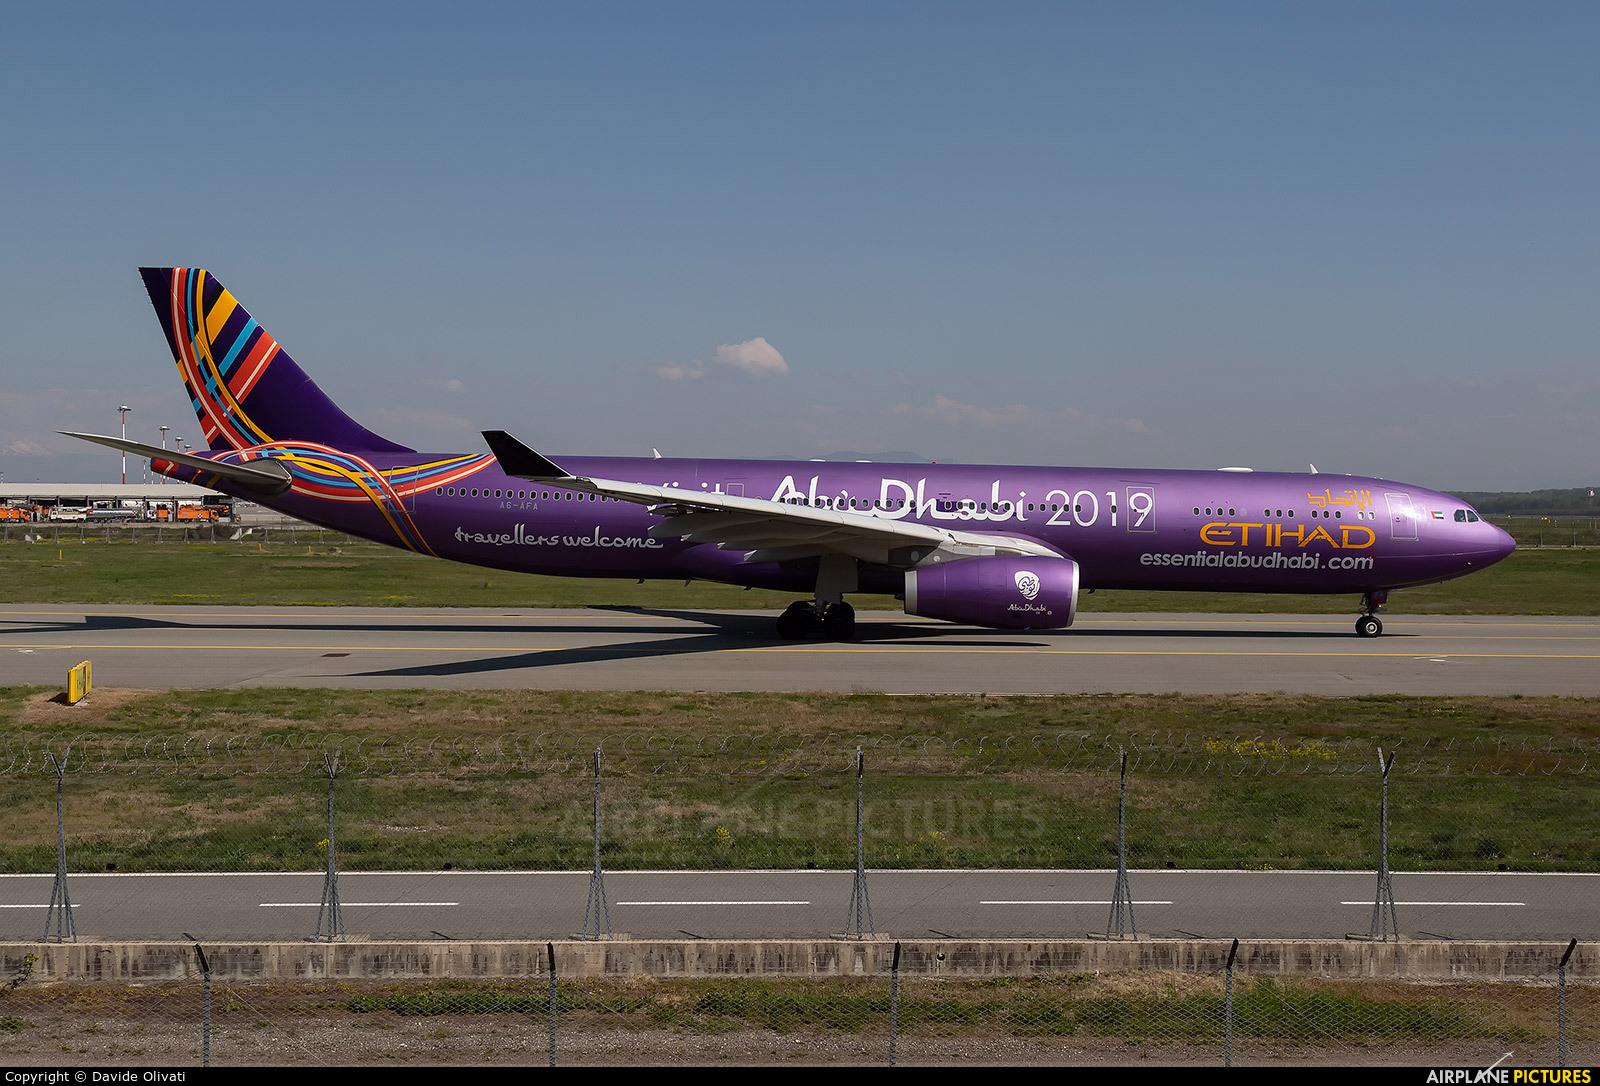 Etihad Airways A6-AFA aircraft at Milan - Malpensa